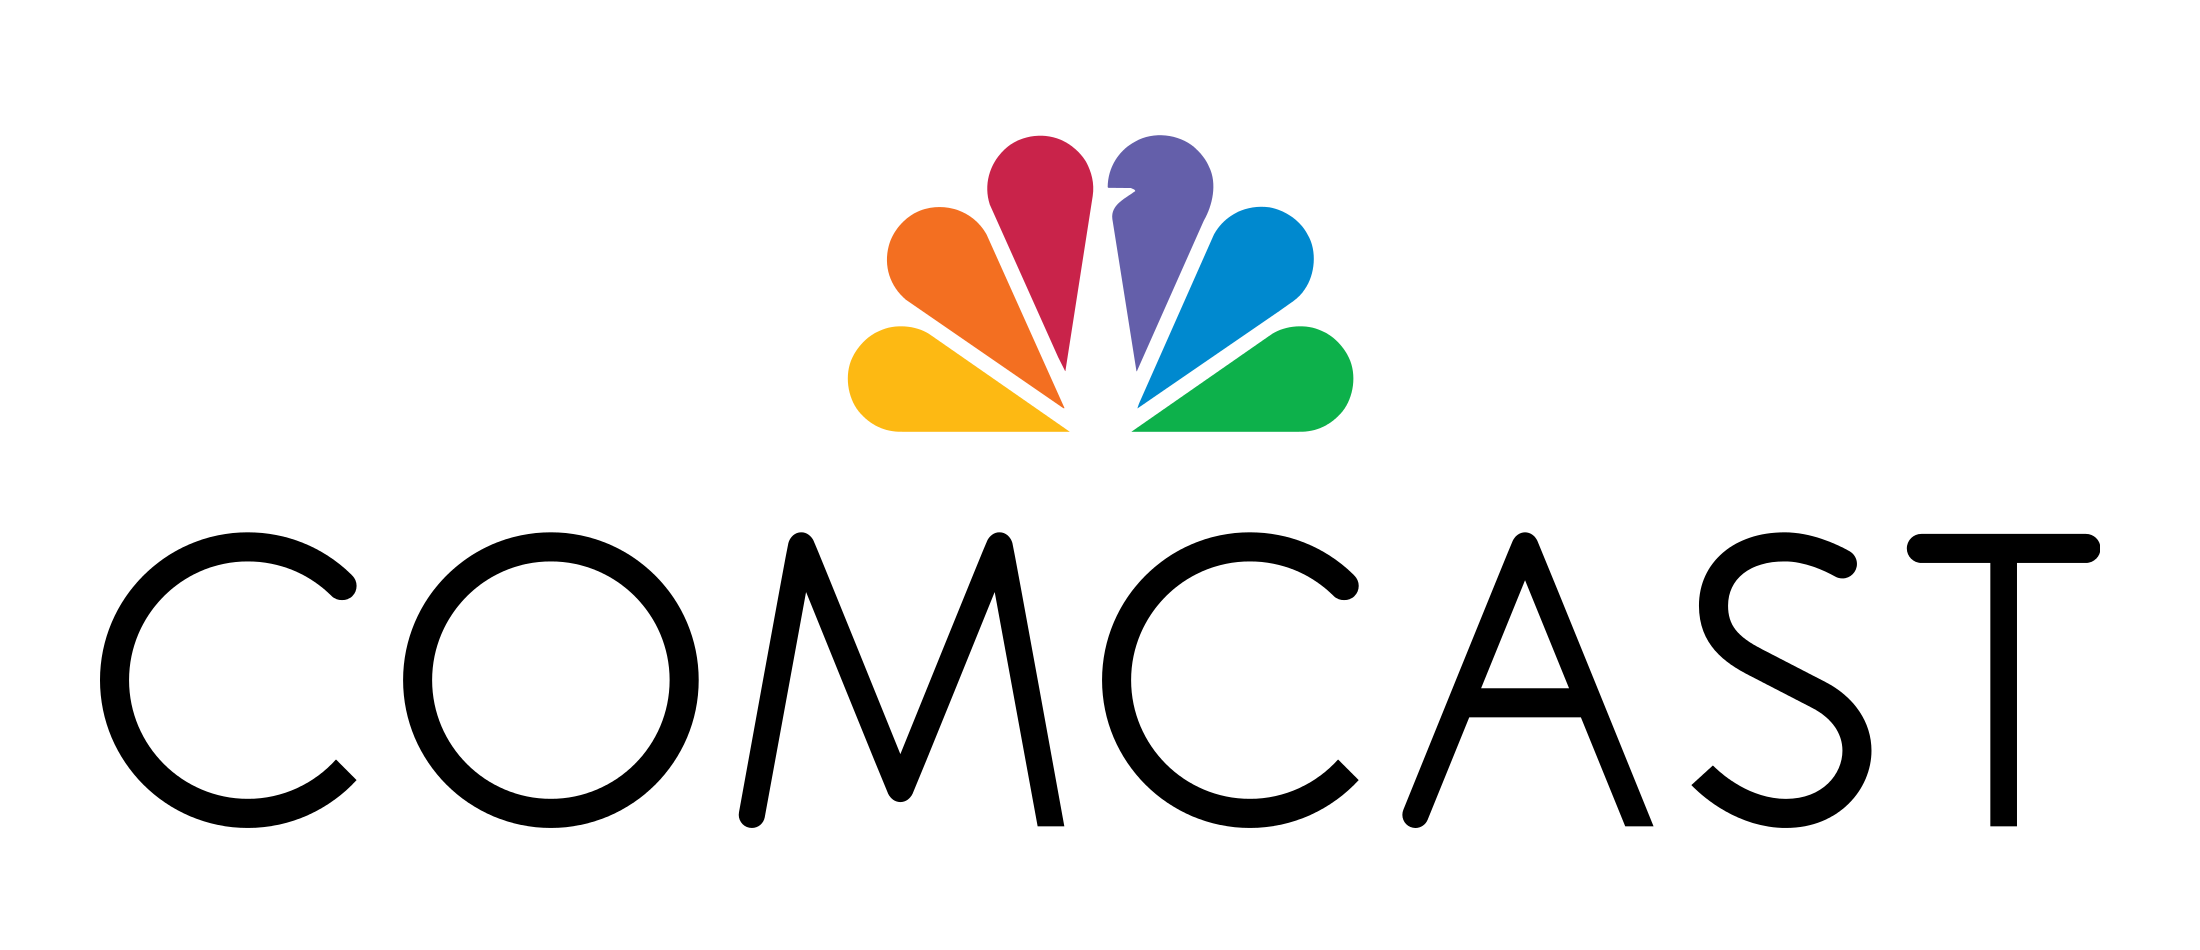 comcast logo comcast symbol meaning history and evolution